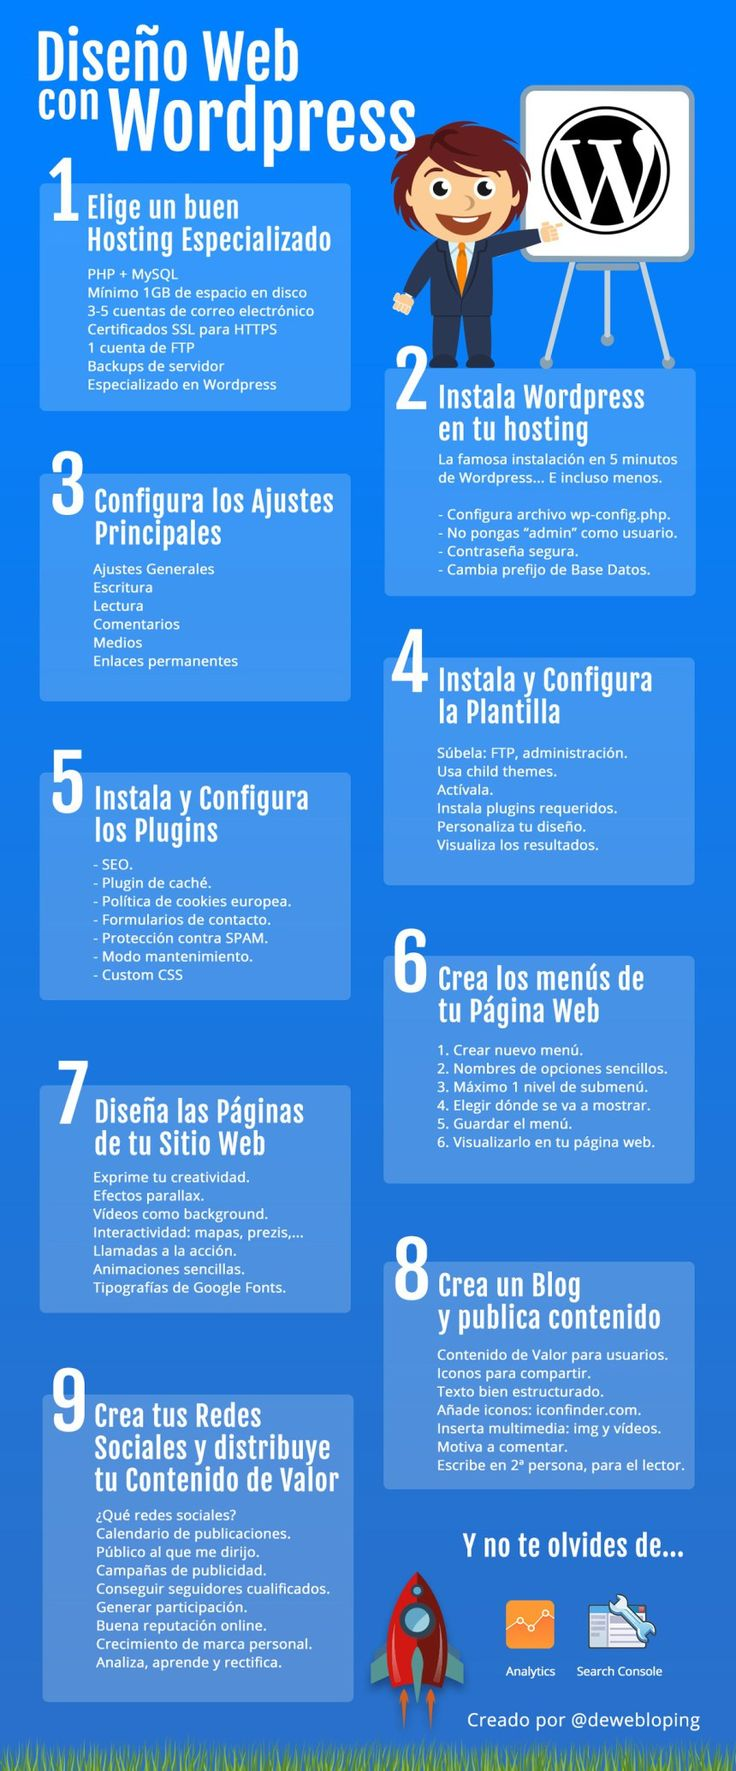 Diseño web con WordPress #infografia